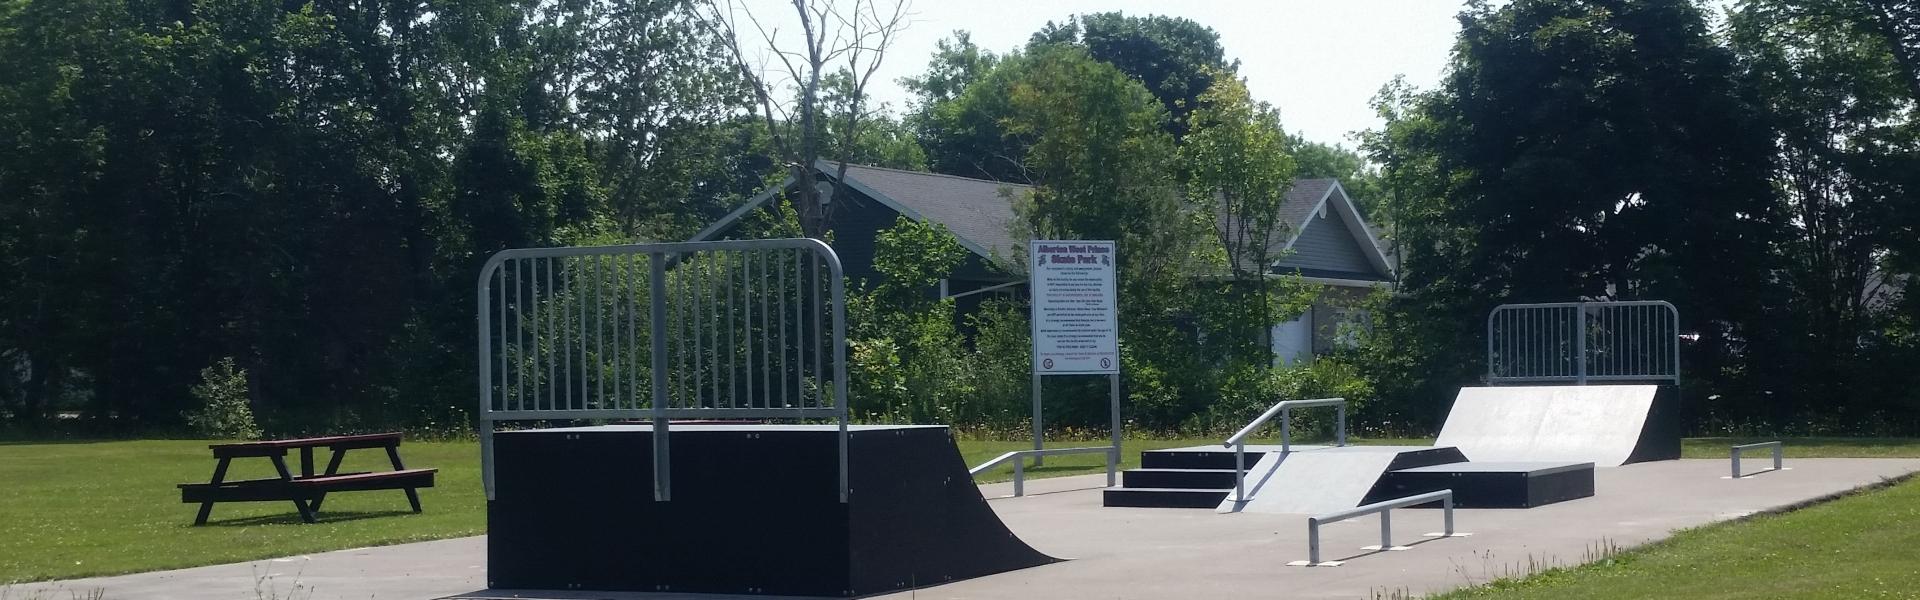 Alberton Skate Park